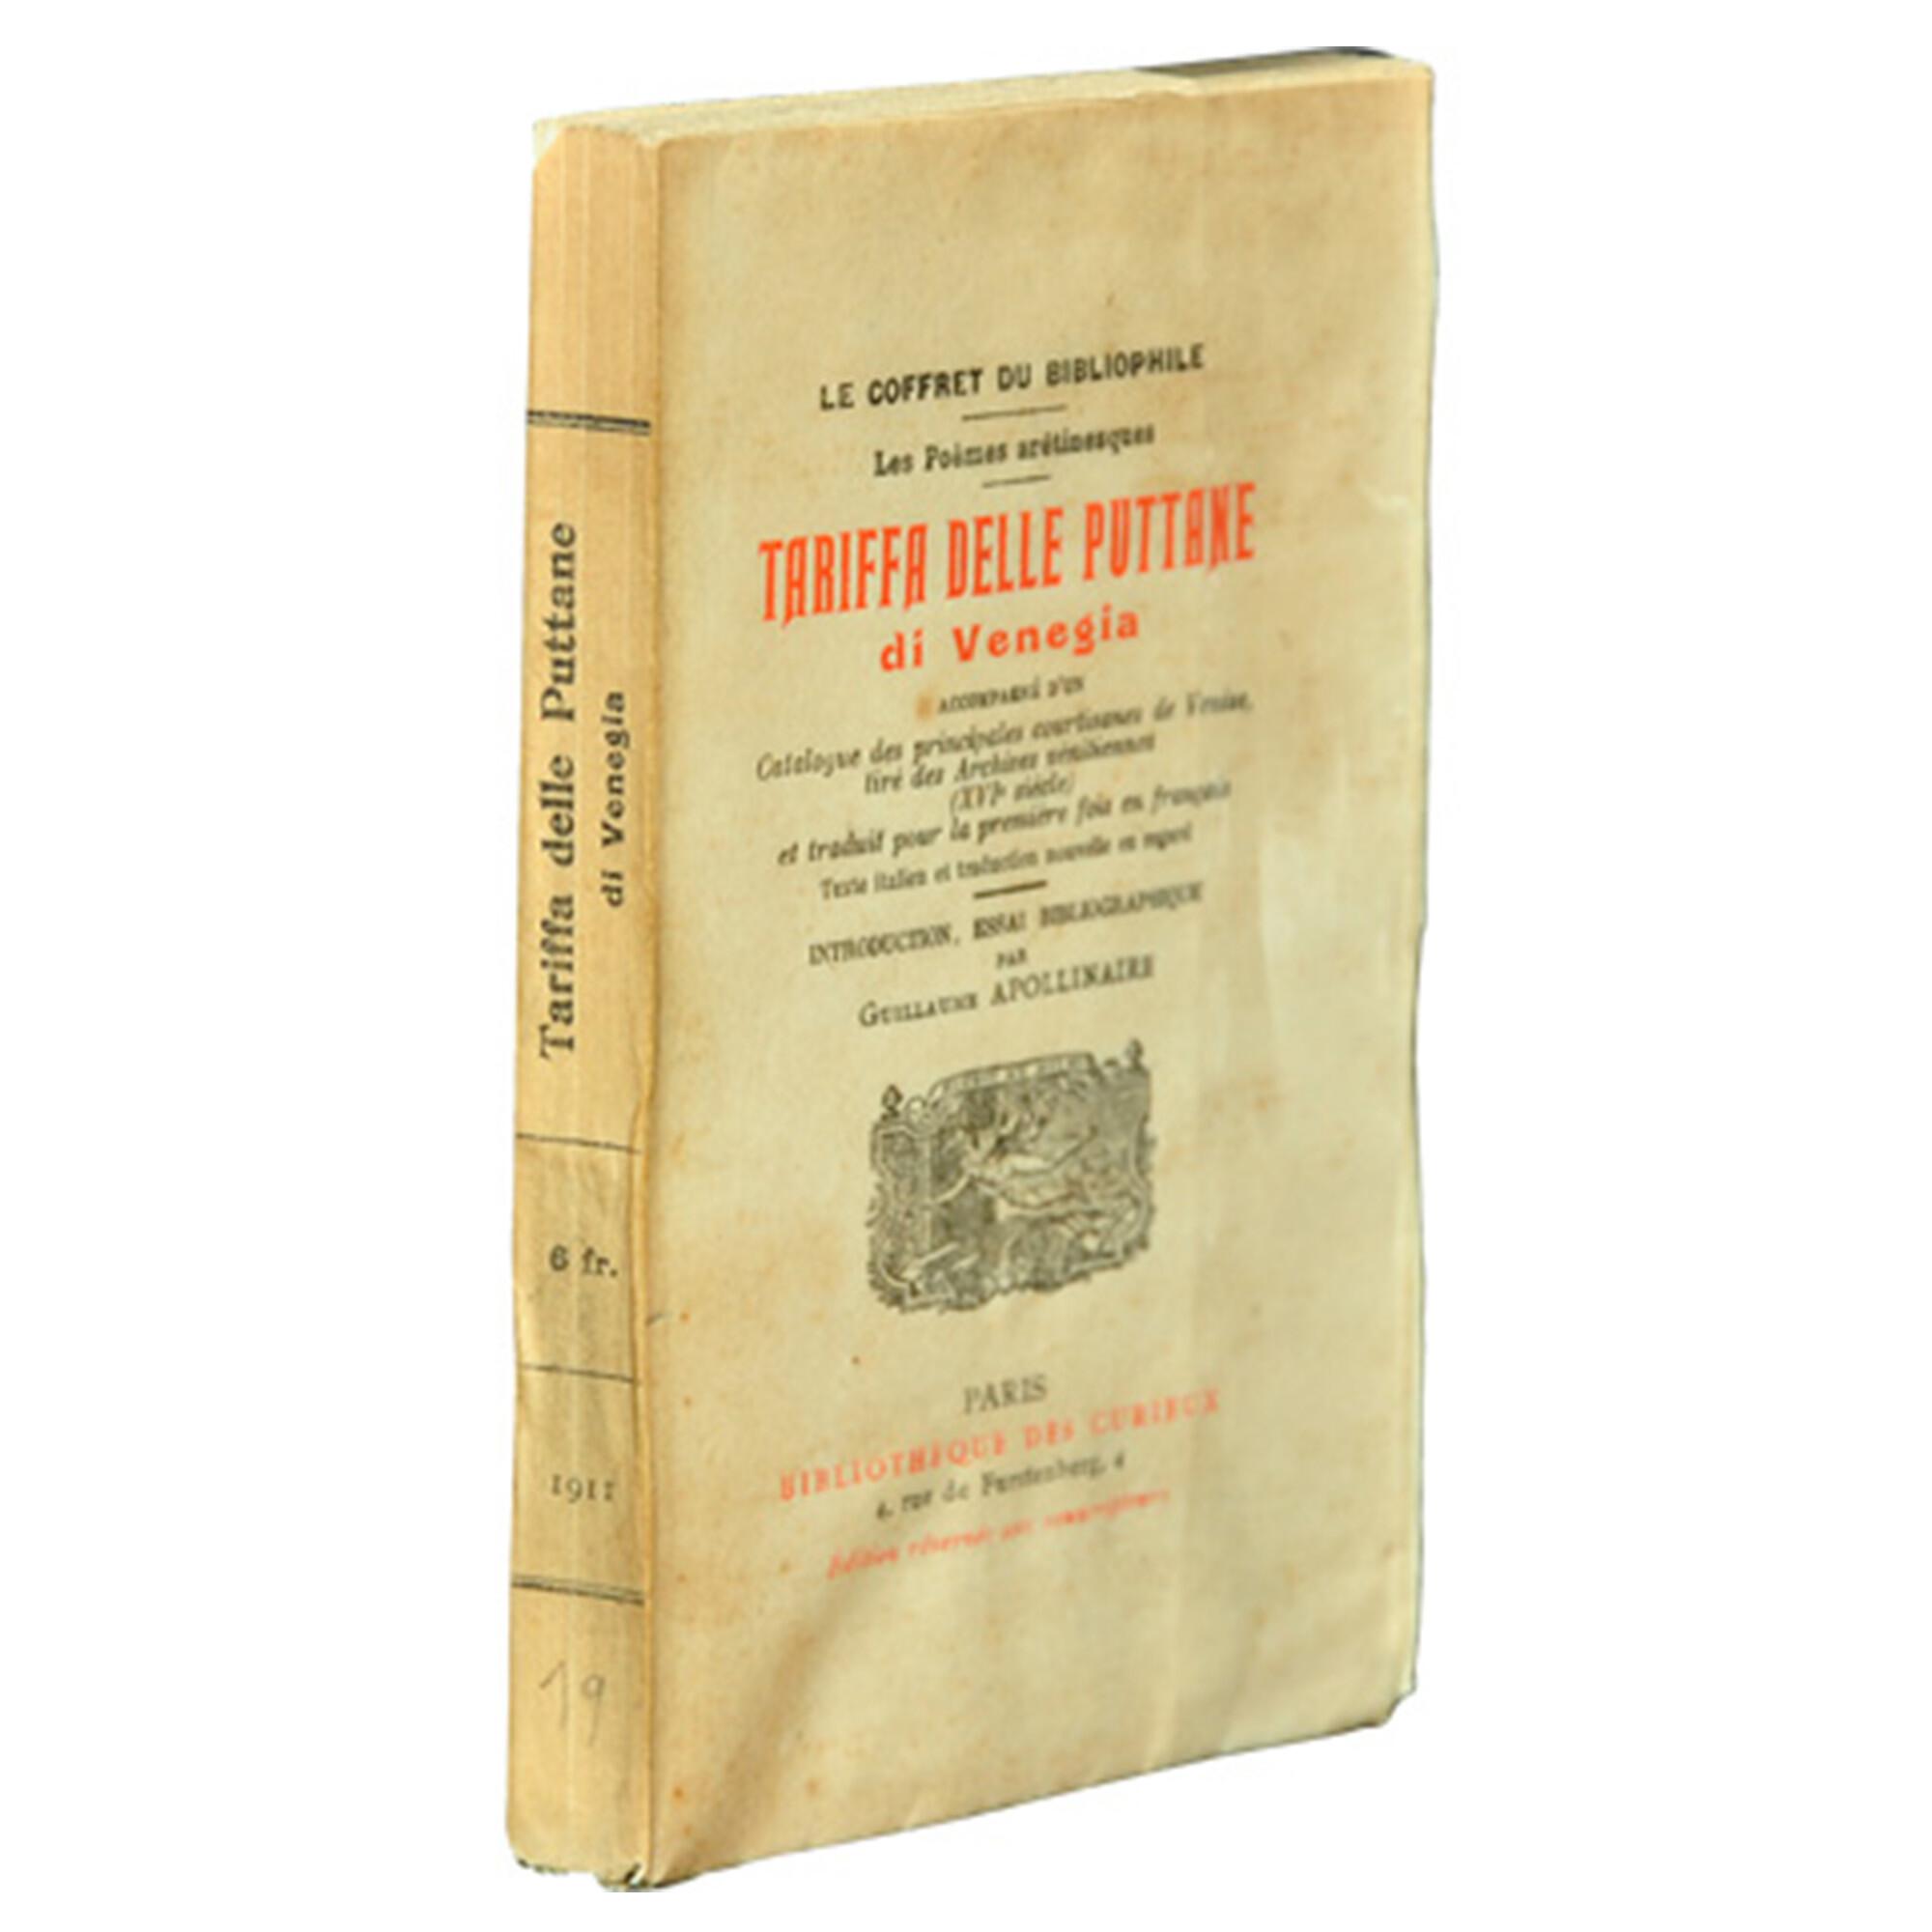 5091-aretino-apollinaire-tariffe-1911